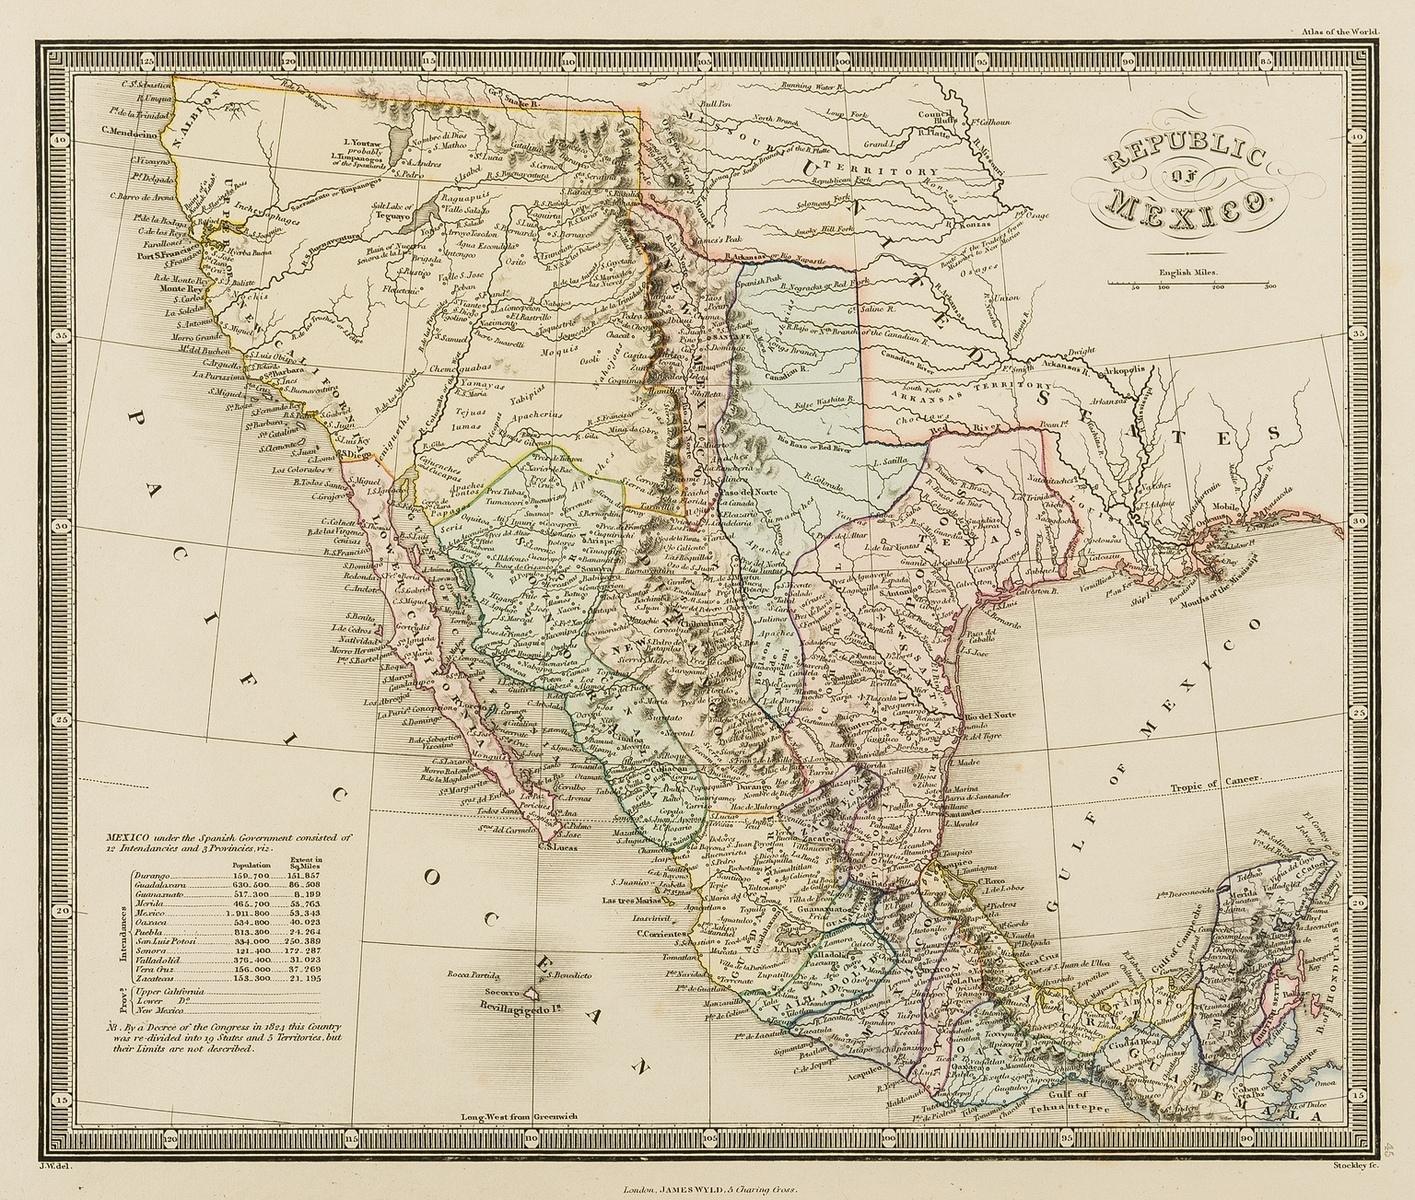 Americas .- Wyld (James) Republic of Mexico, [c. 1845].